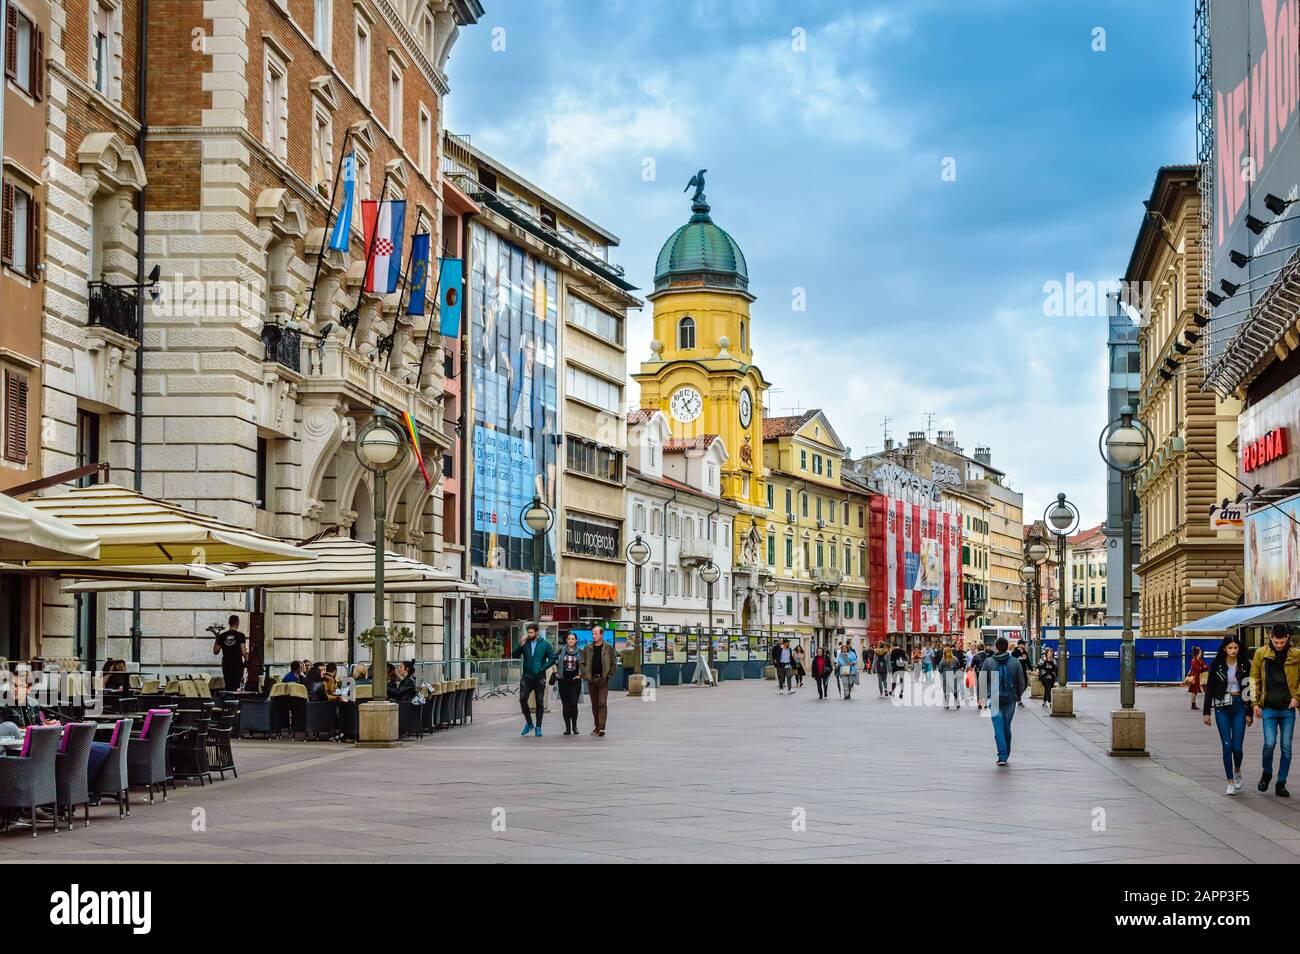 Rijeka, Croatia - May 19, 2019: City Clock Tower and Korzo, the main promenade in Rijeka, Croatia. Shopping street in town center with shops, cafes an Stock Photo